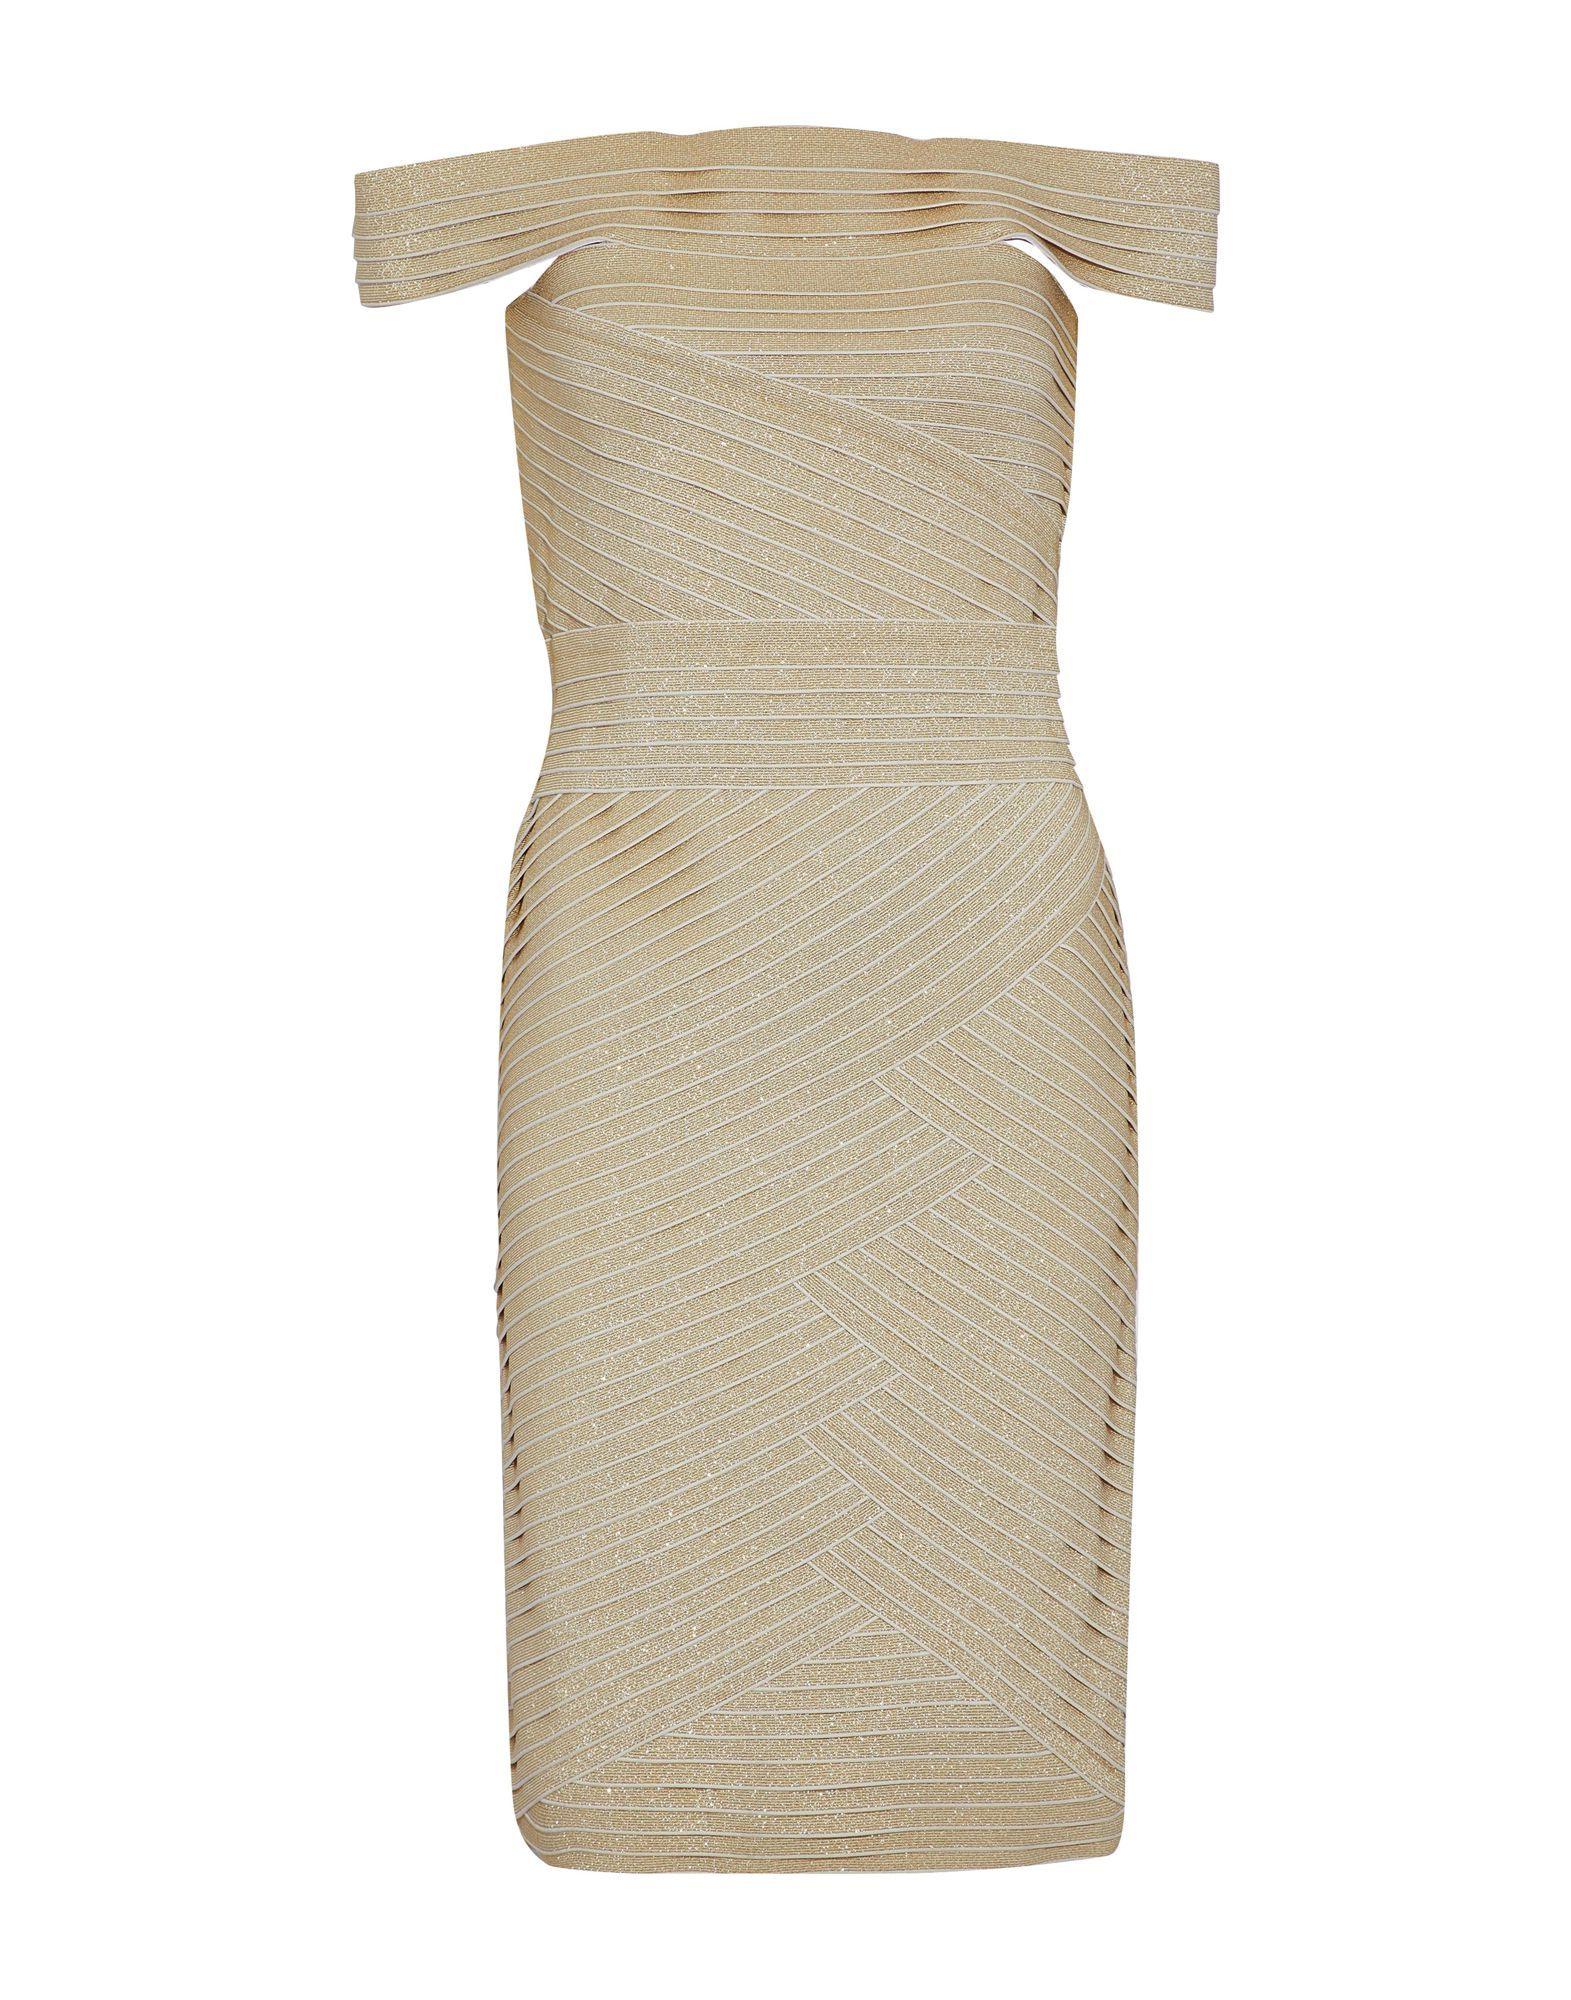 Pierre Balmain Gold Knit Dress